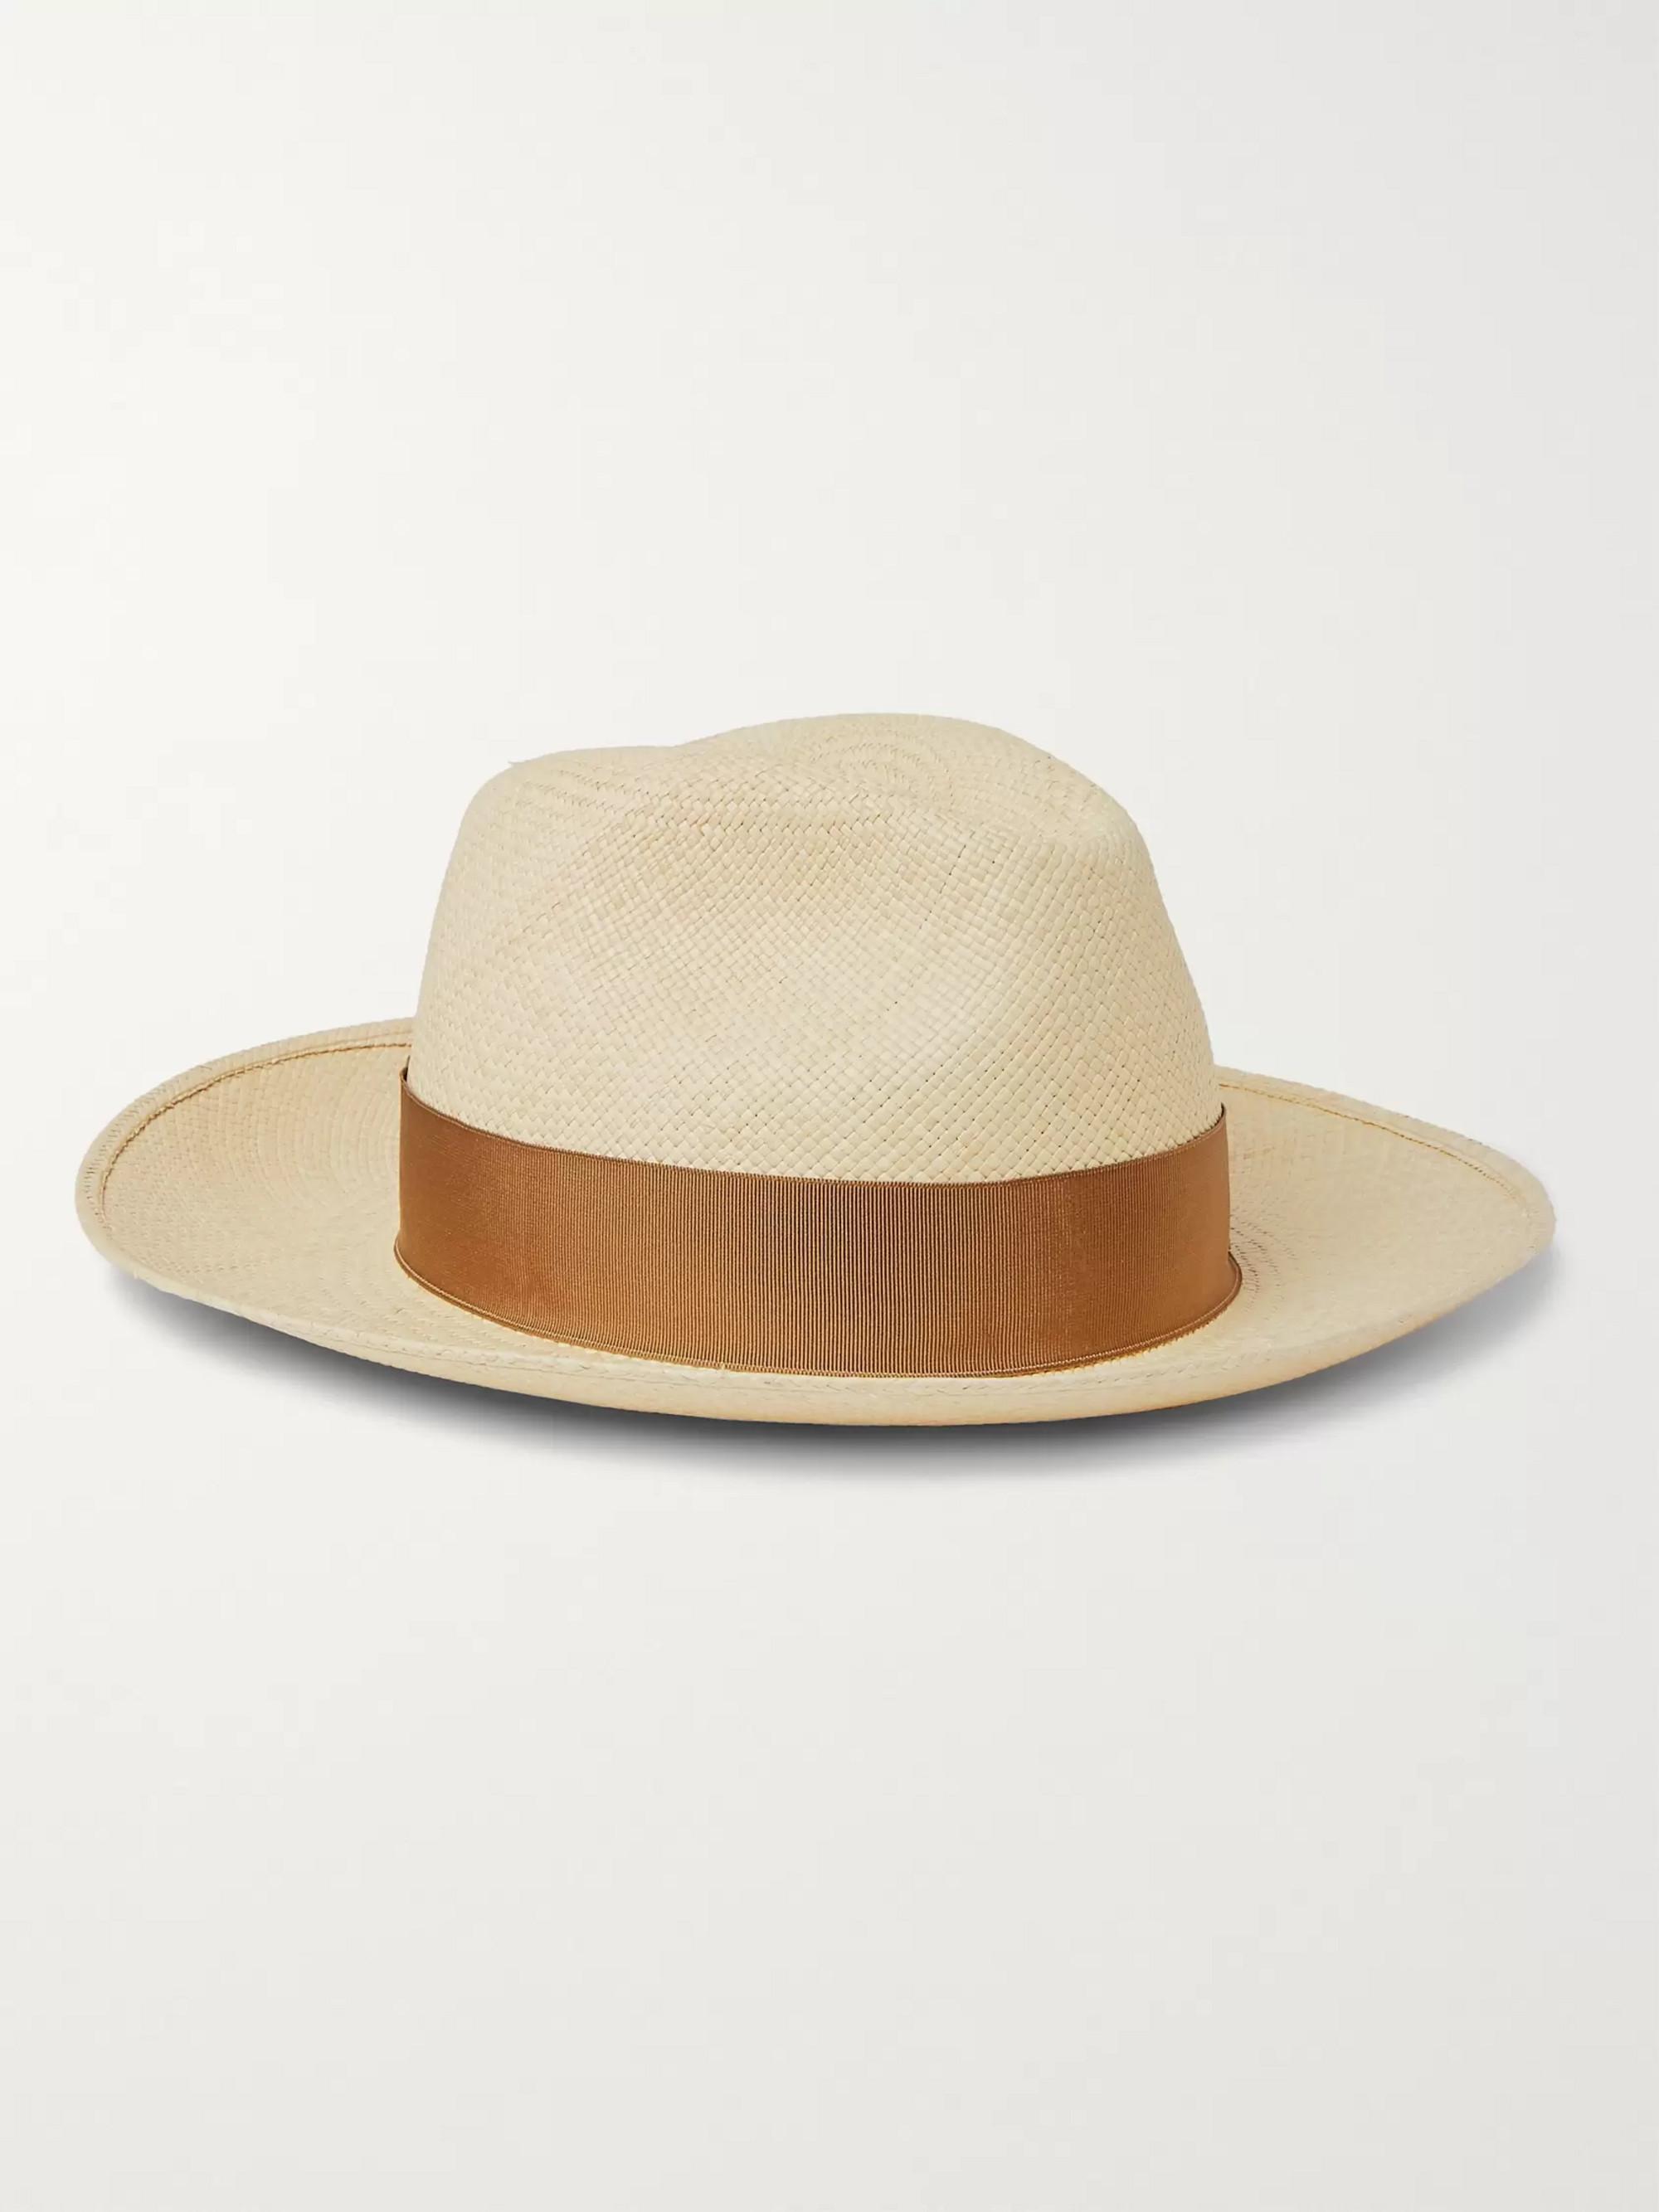 687dea55189a5c Tan Grosgrain-Trimmed Straw Panama Hat | Borsalino | MR PORTER